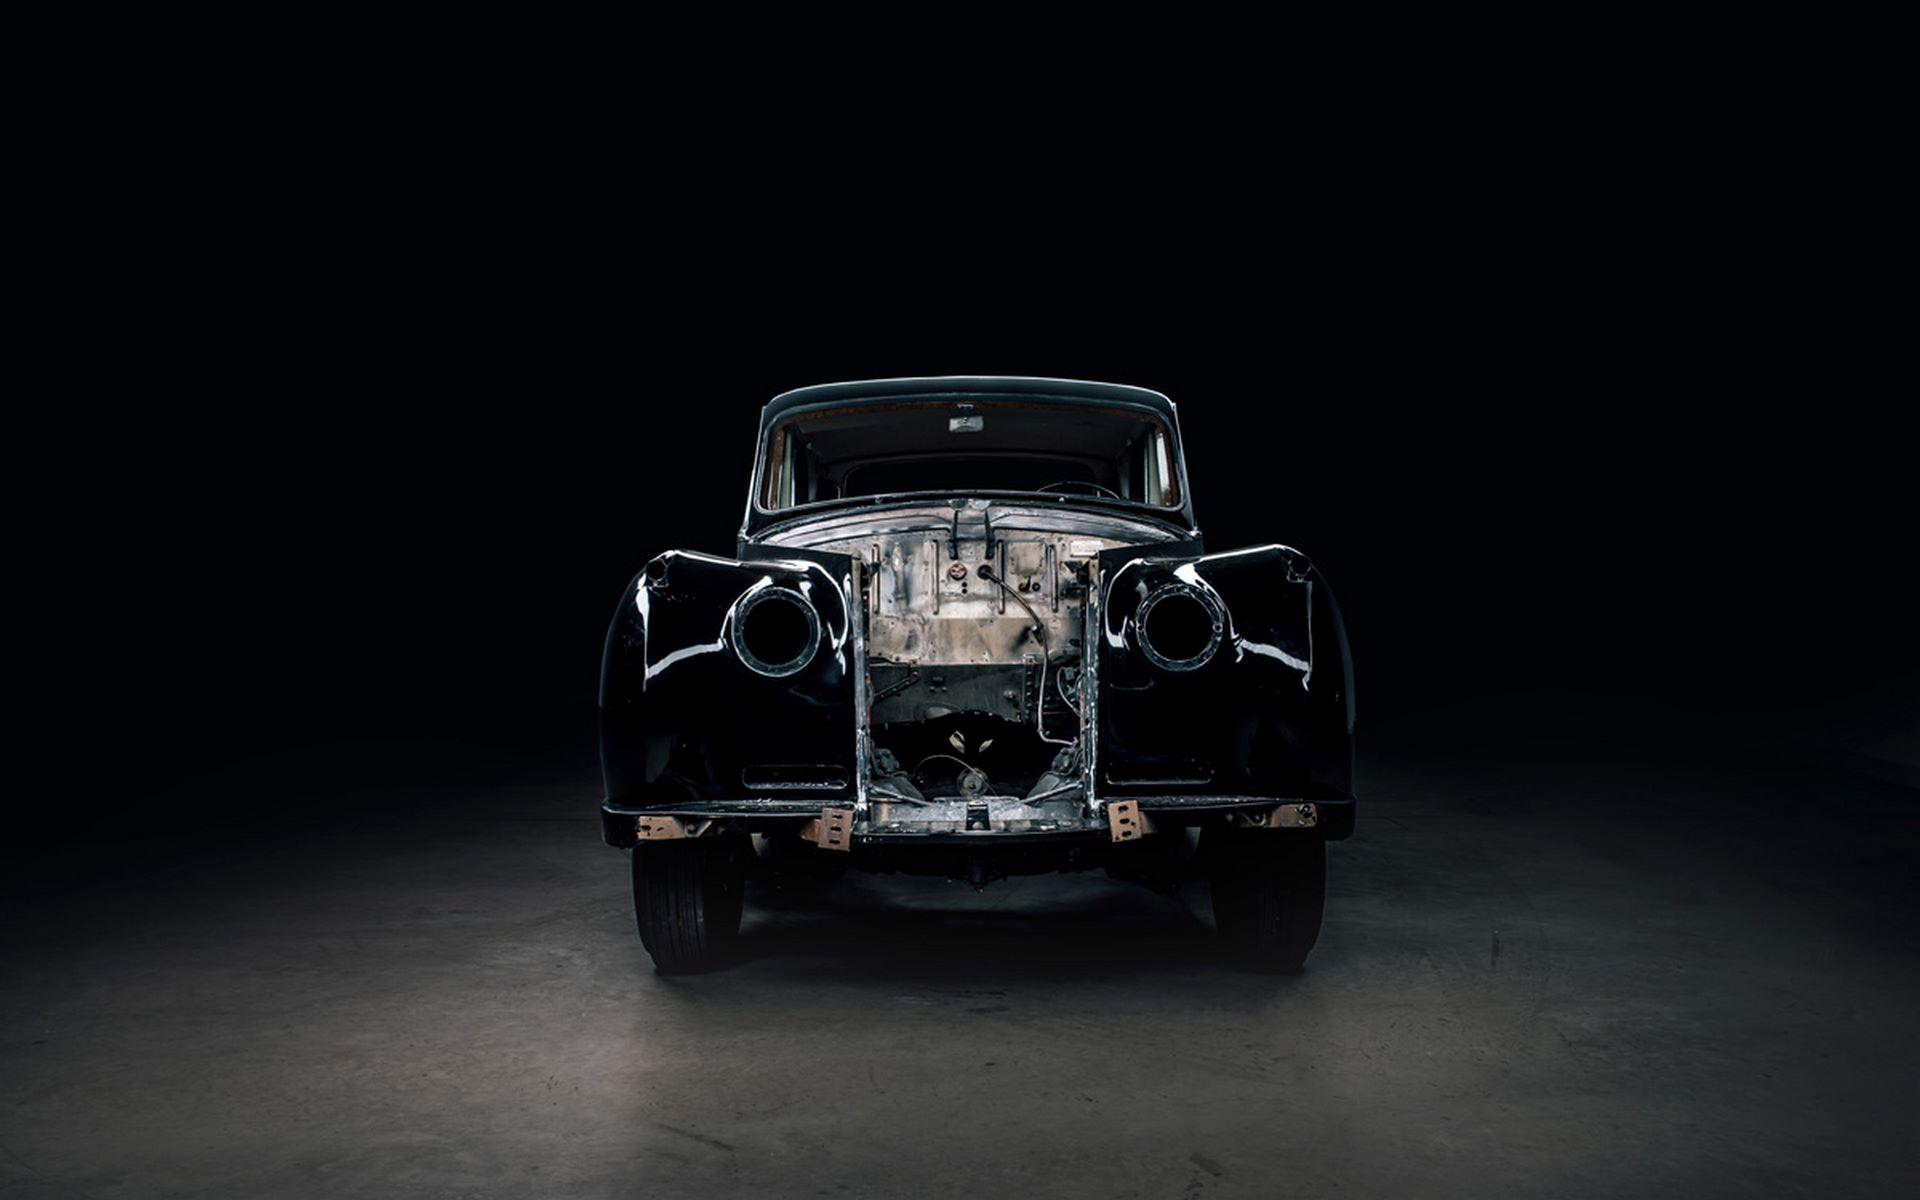 Electris-Rolls-Royce-Phantom-V-and-Silver-Cloud-by-Lunaz-23